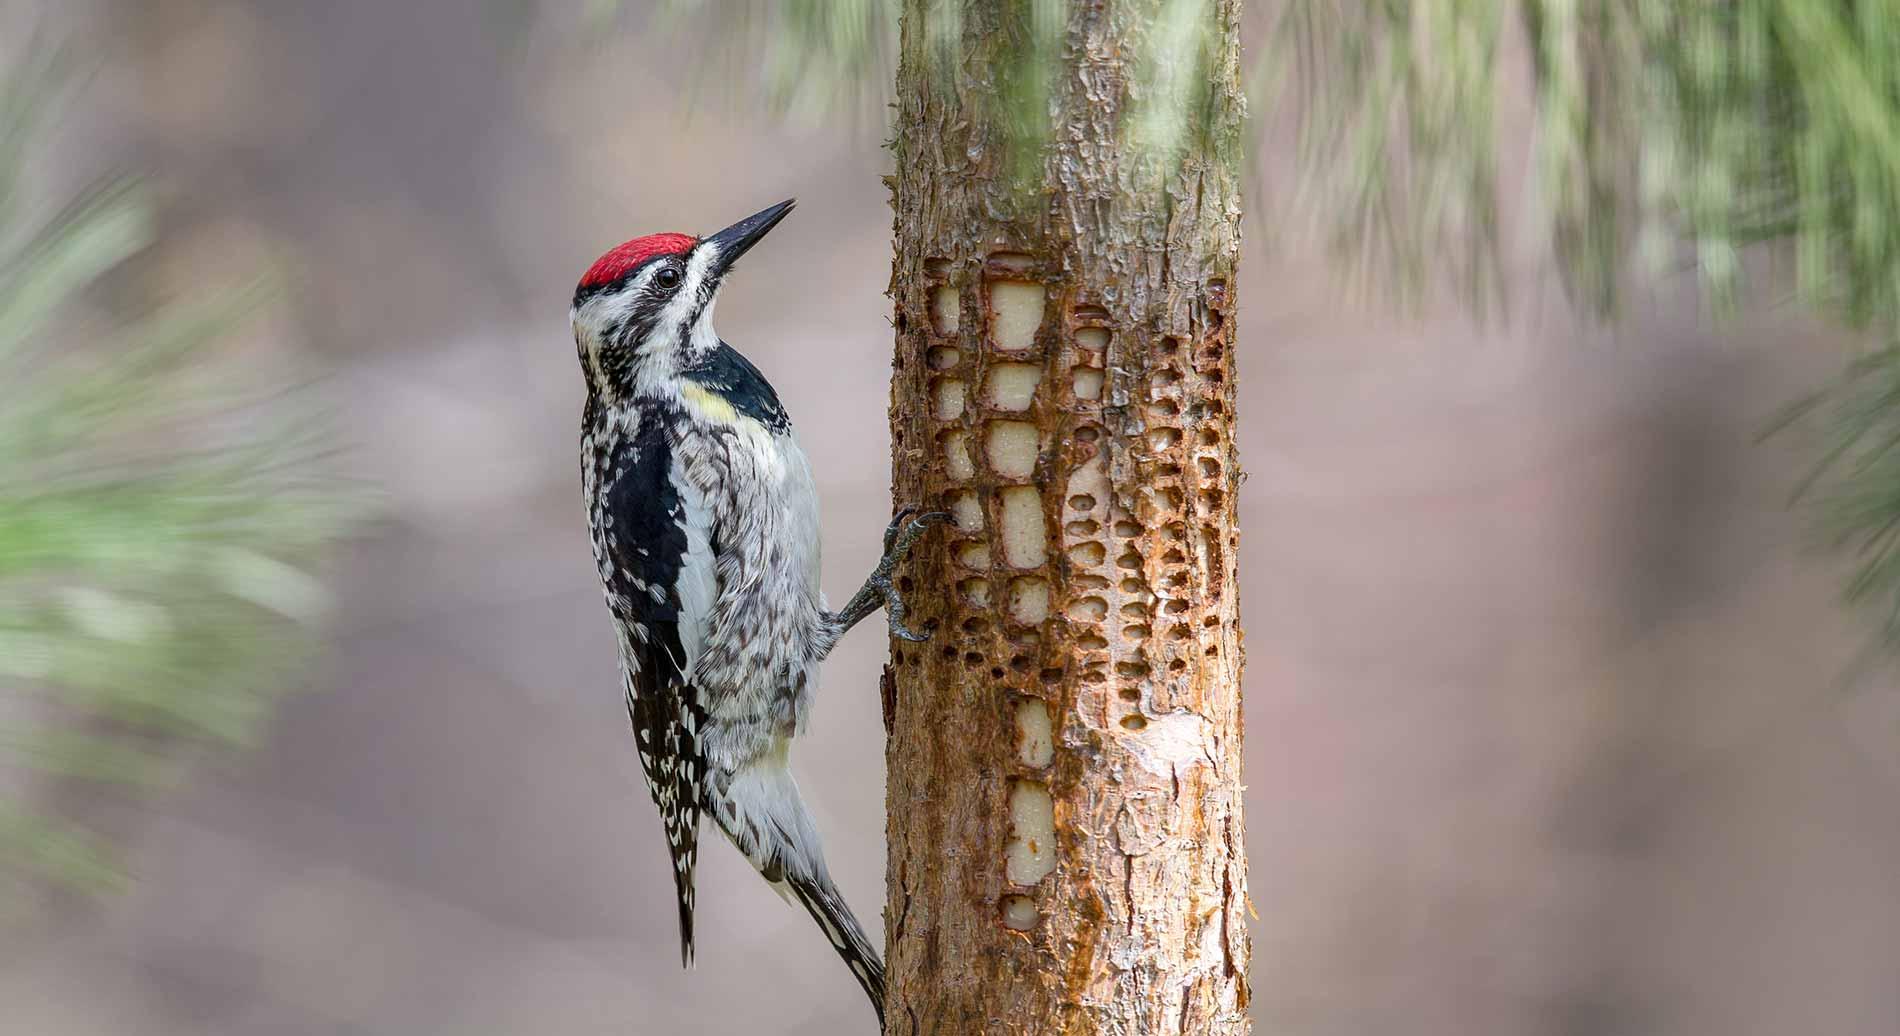 sapsucker-and-a-woodpecker